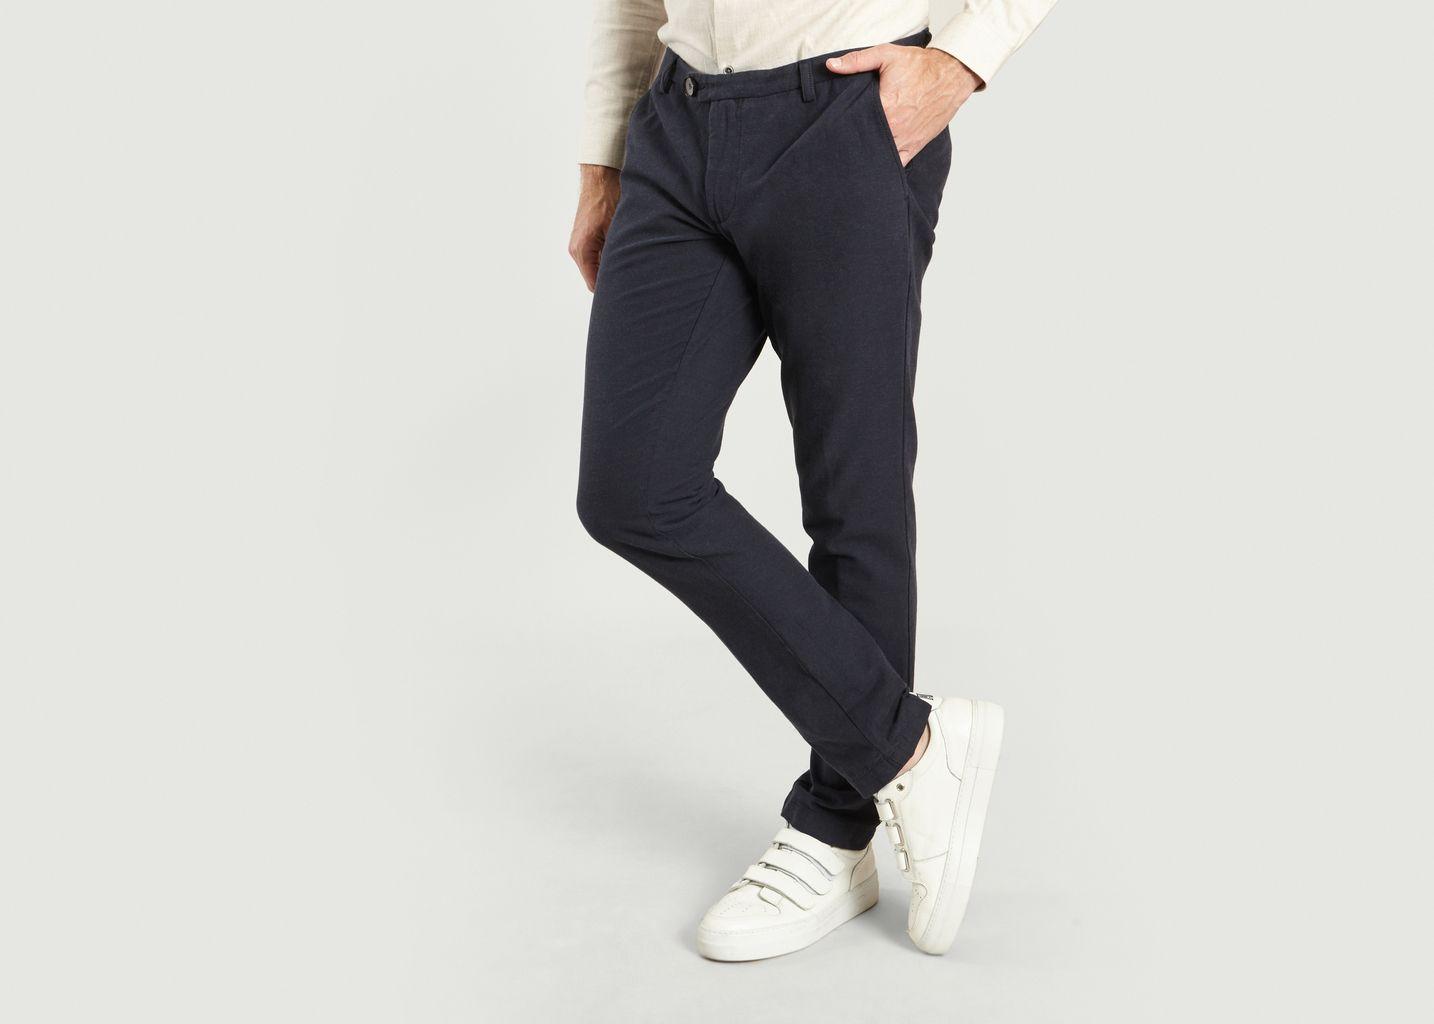 Pantalon City 2 - JagVi